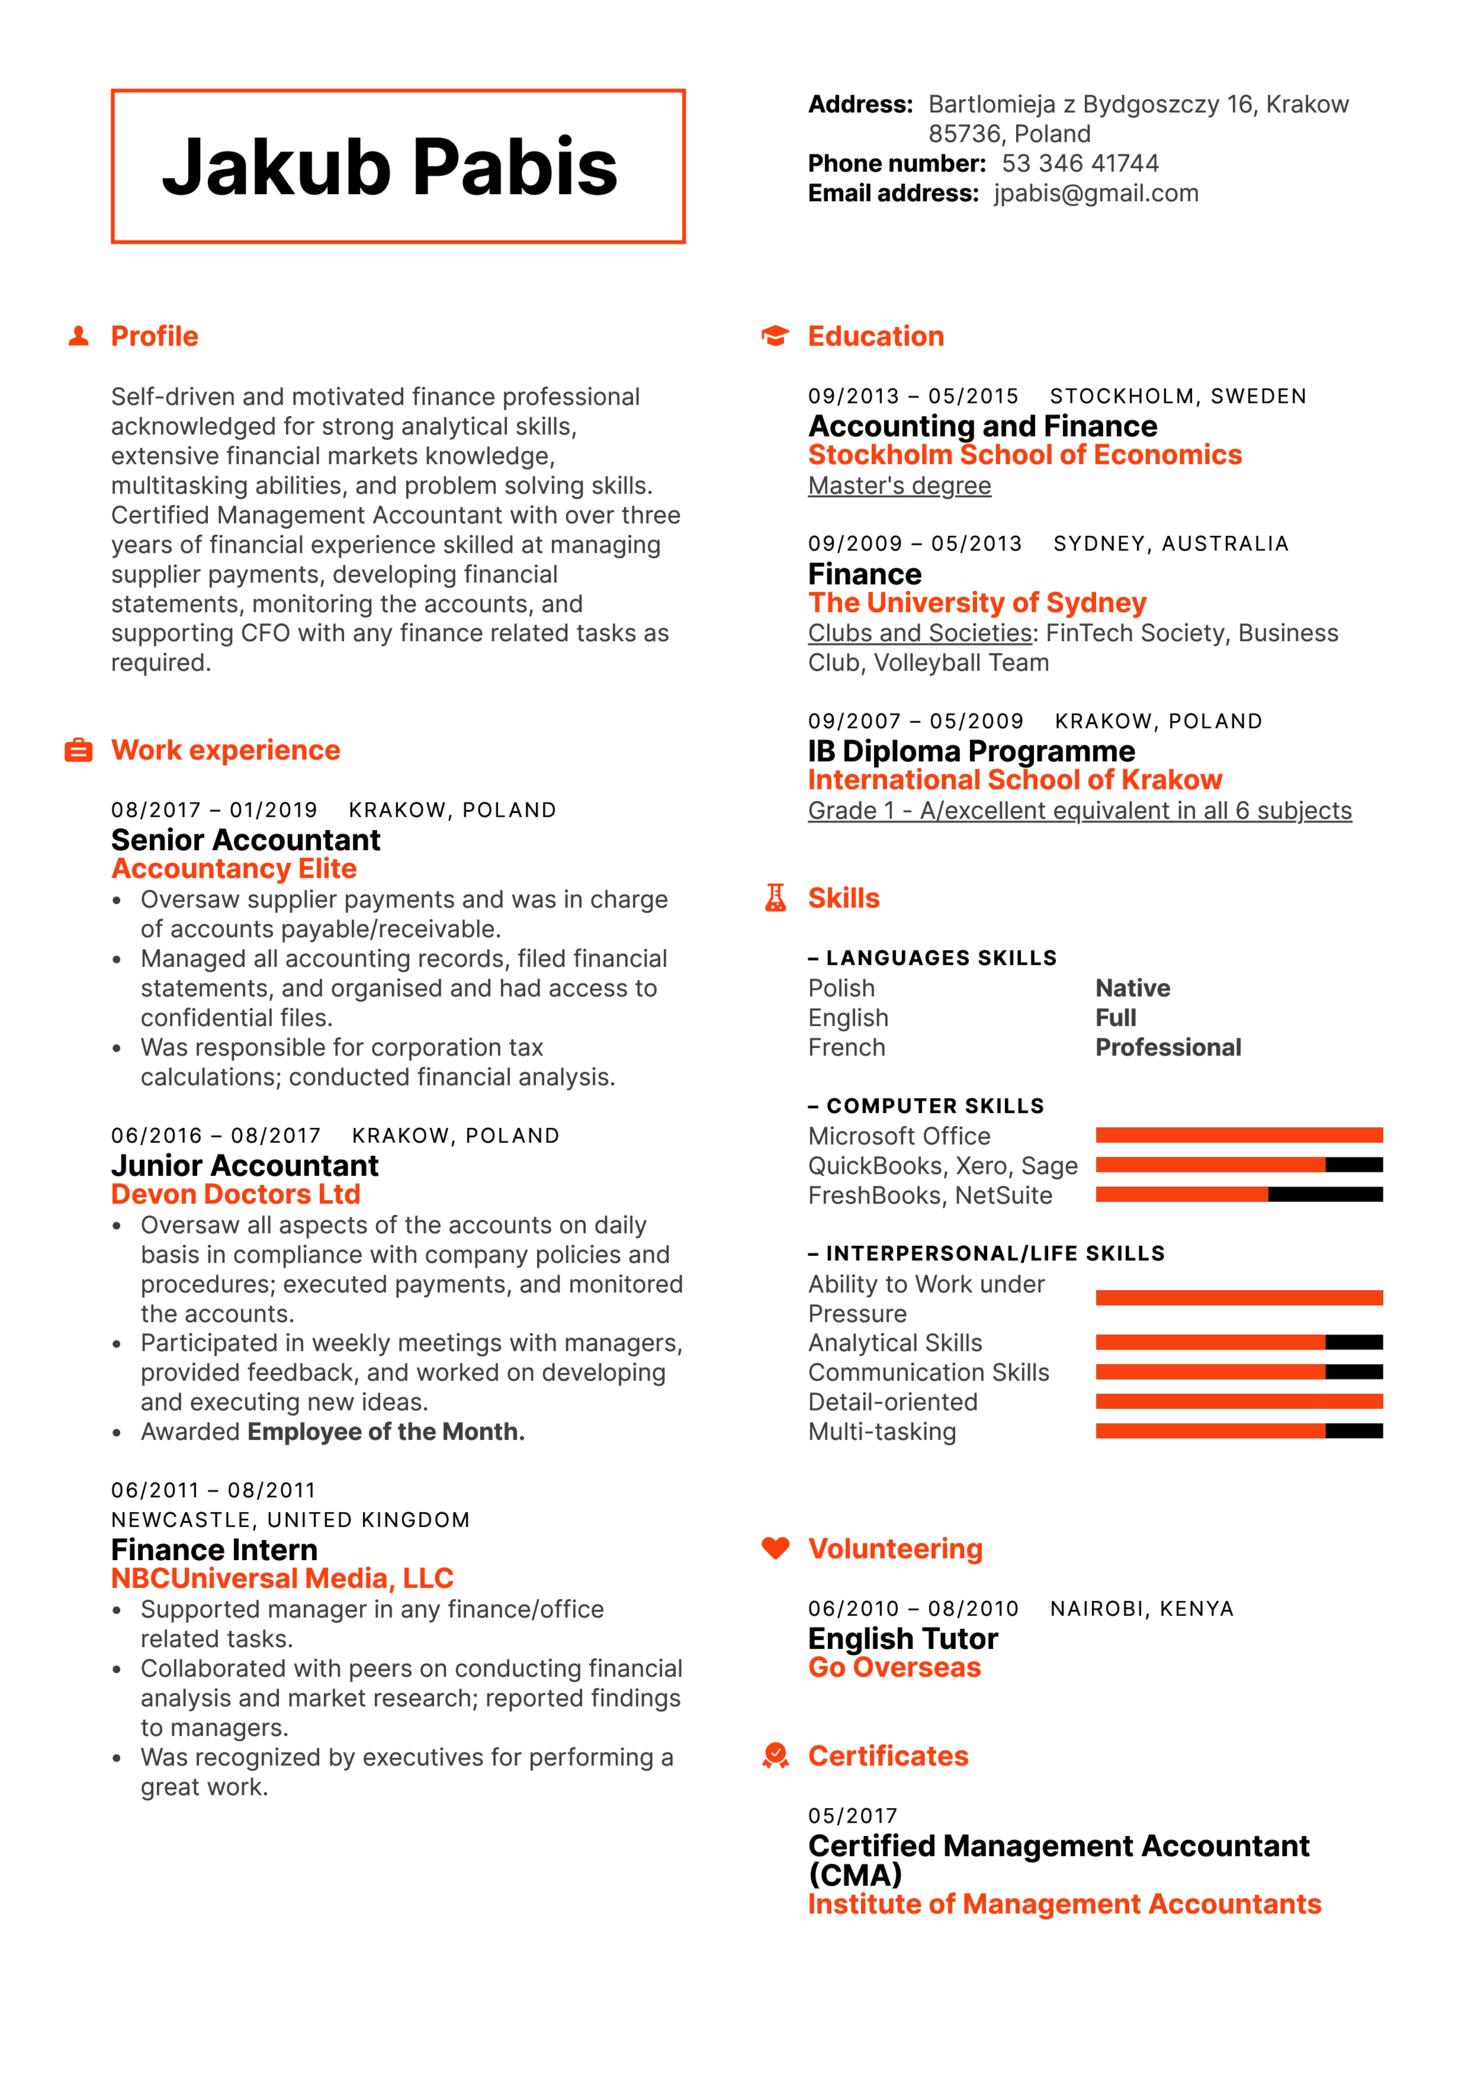 Senior Accountant Resume Template (Part 1)